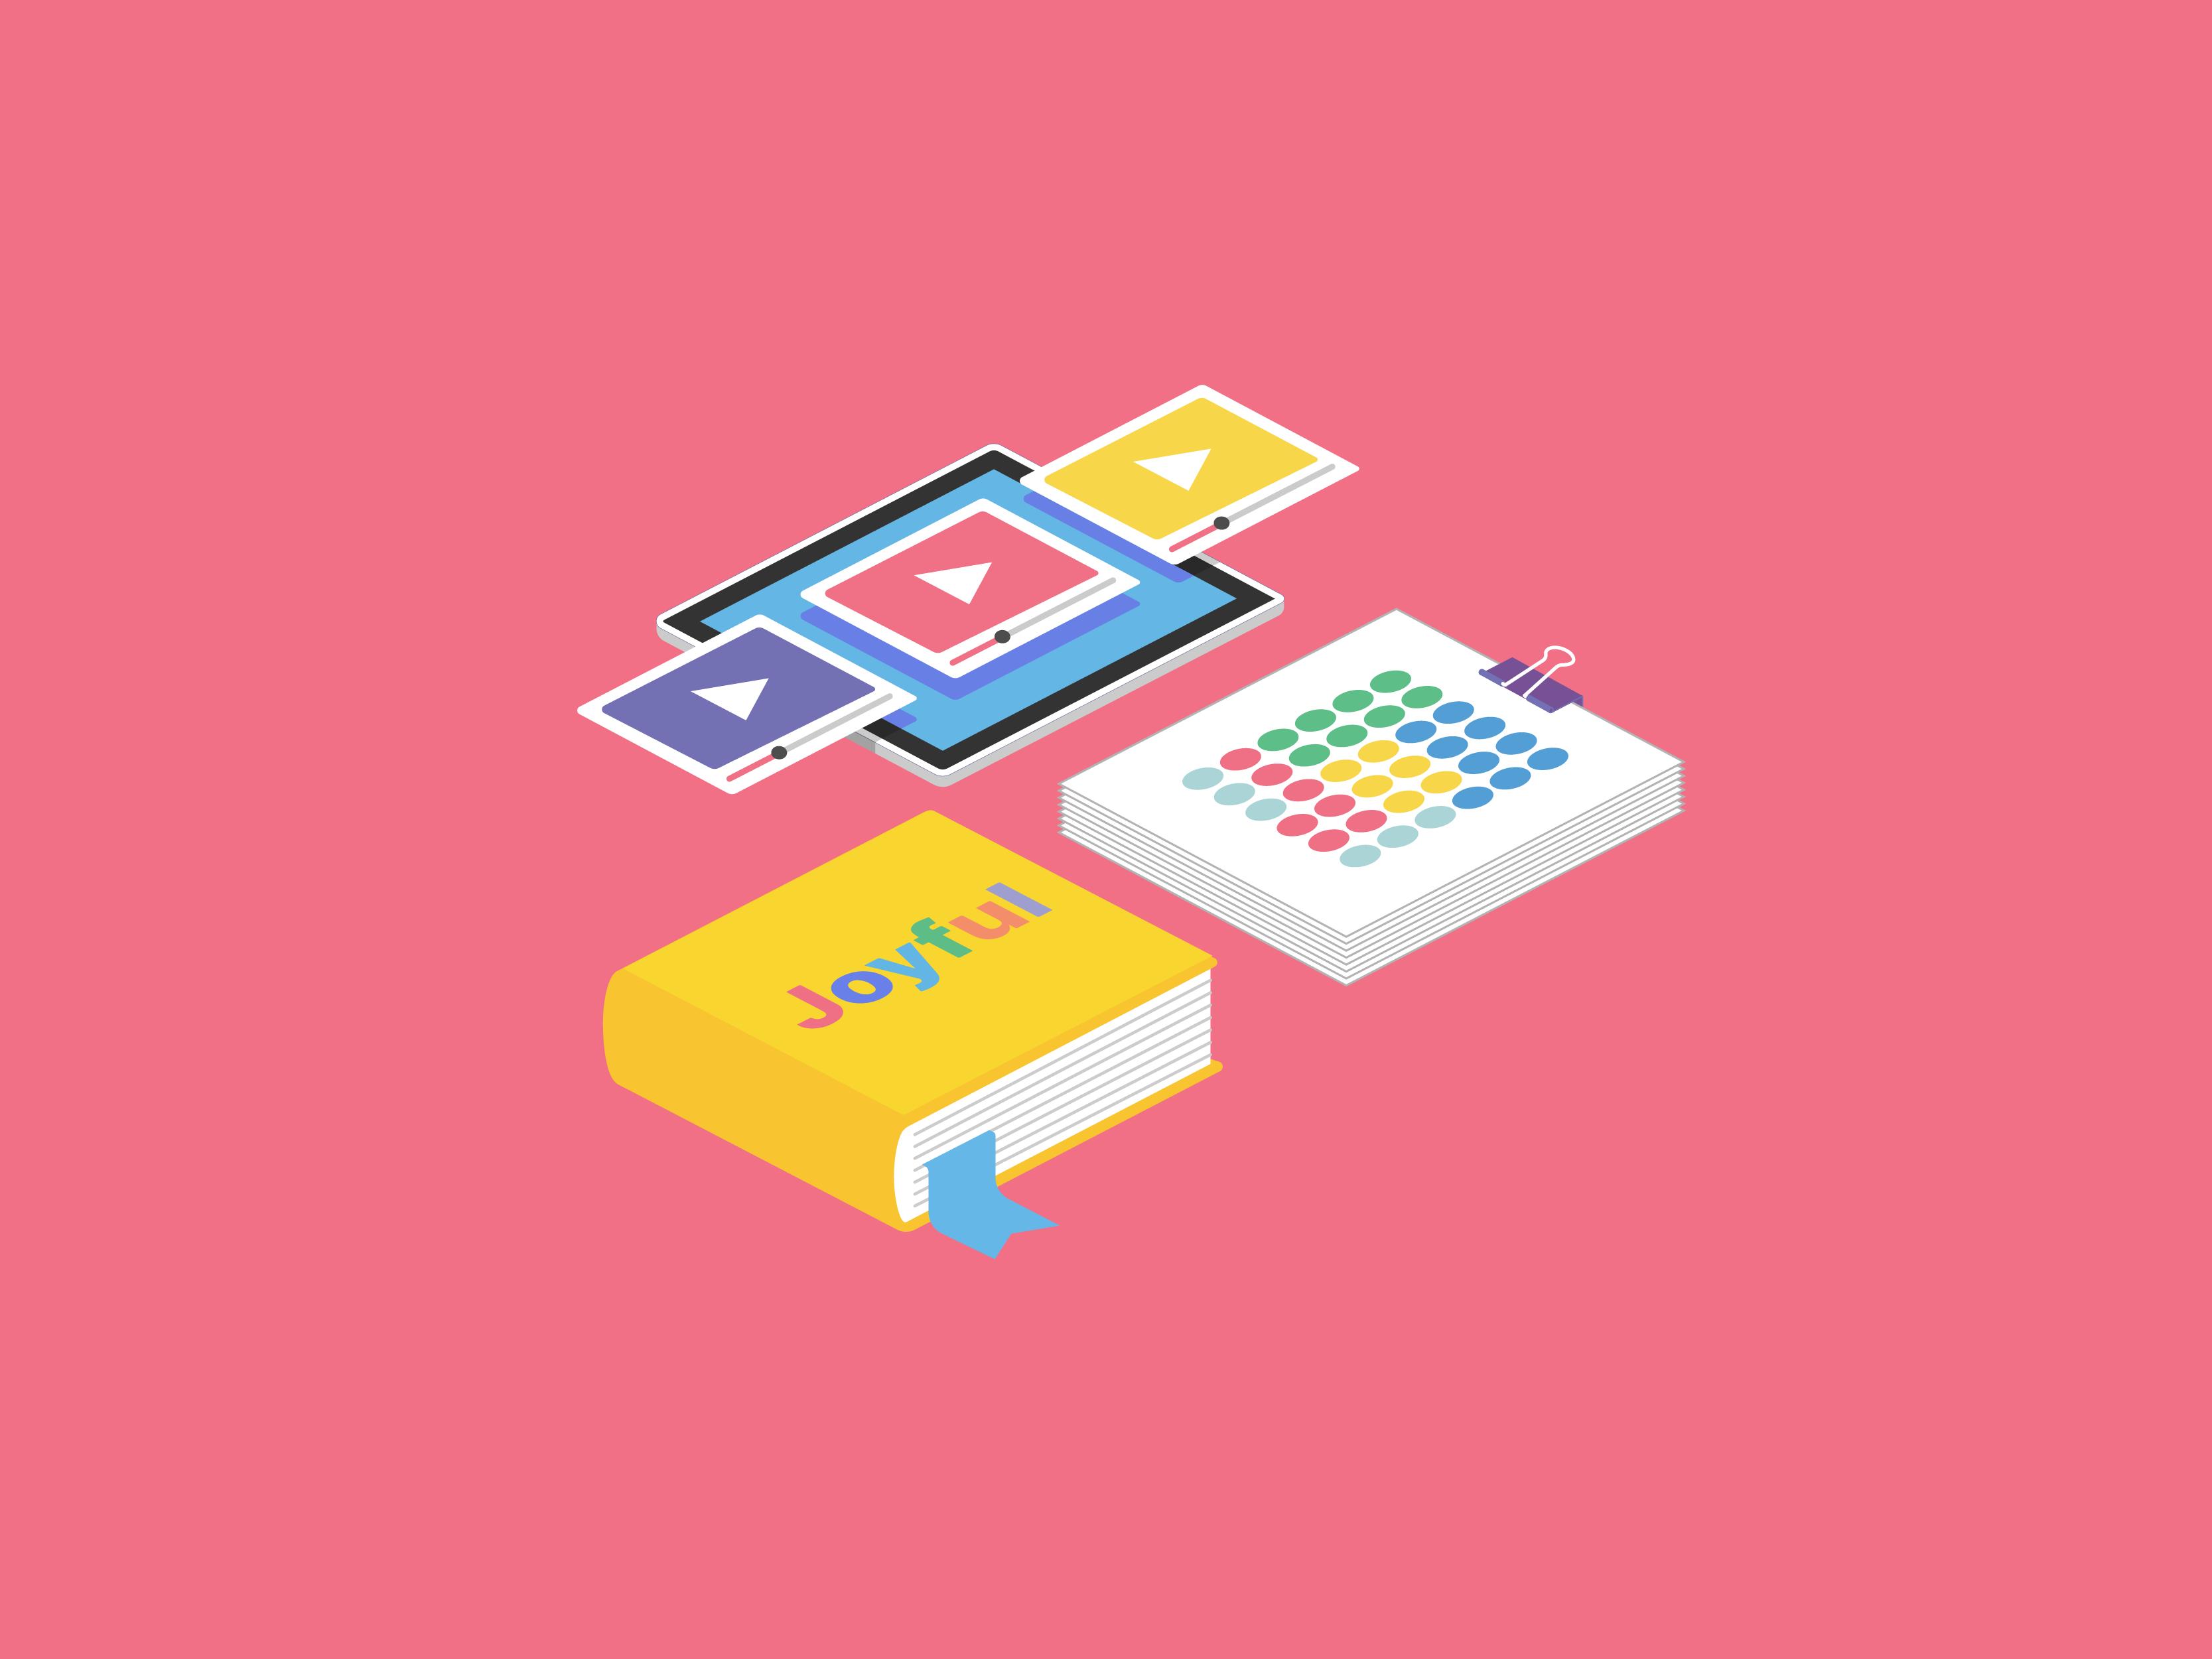 video bundle illustration for joyful literacy brand identity design